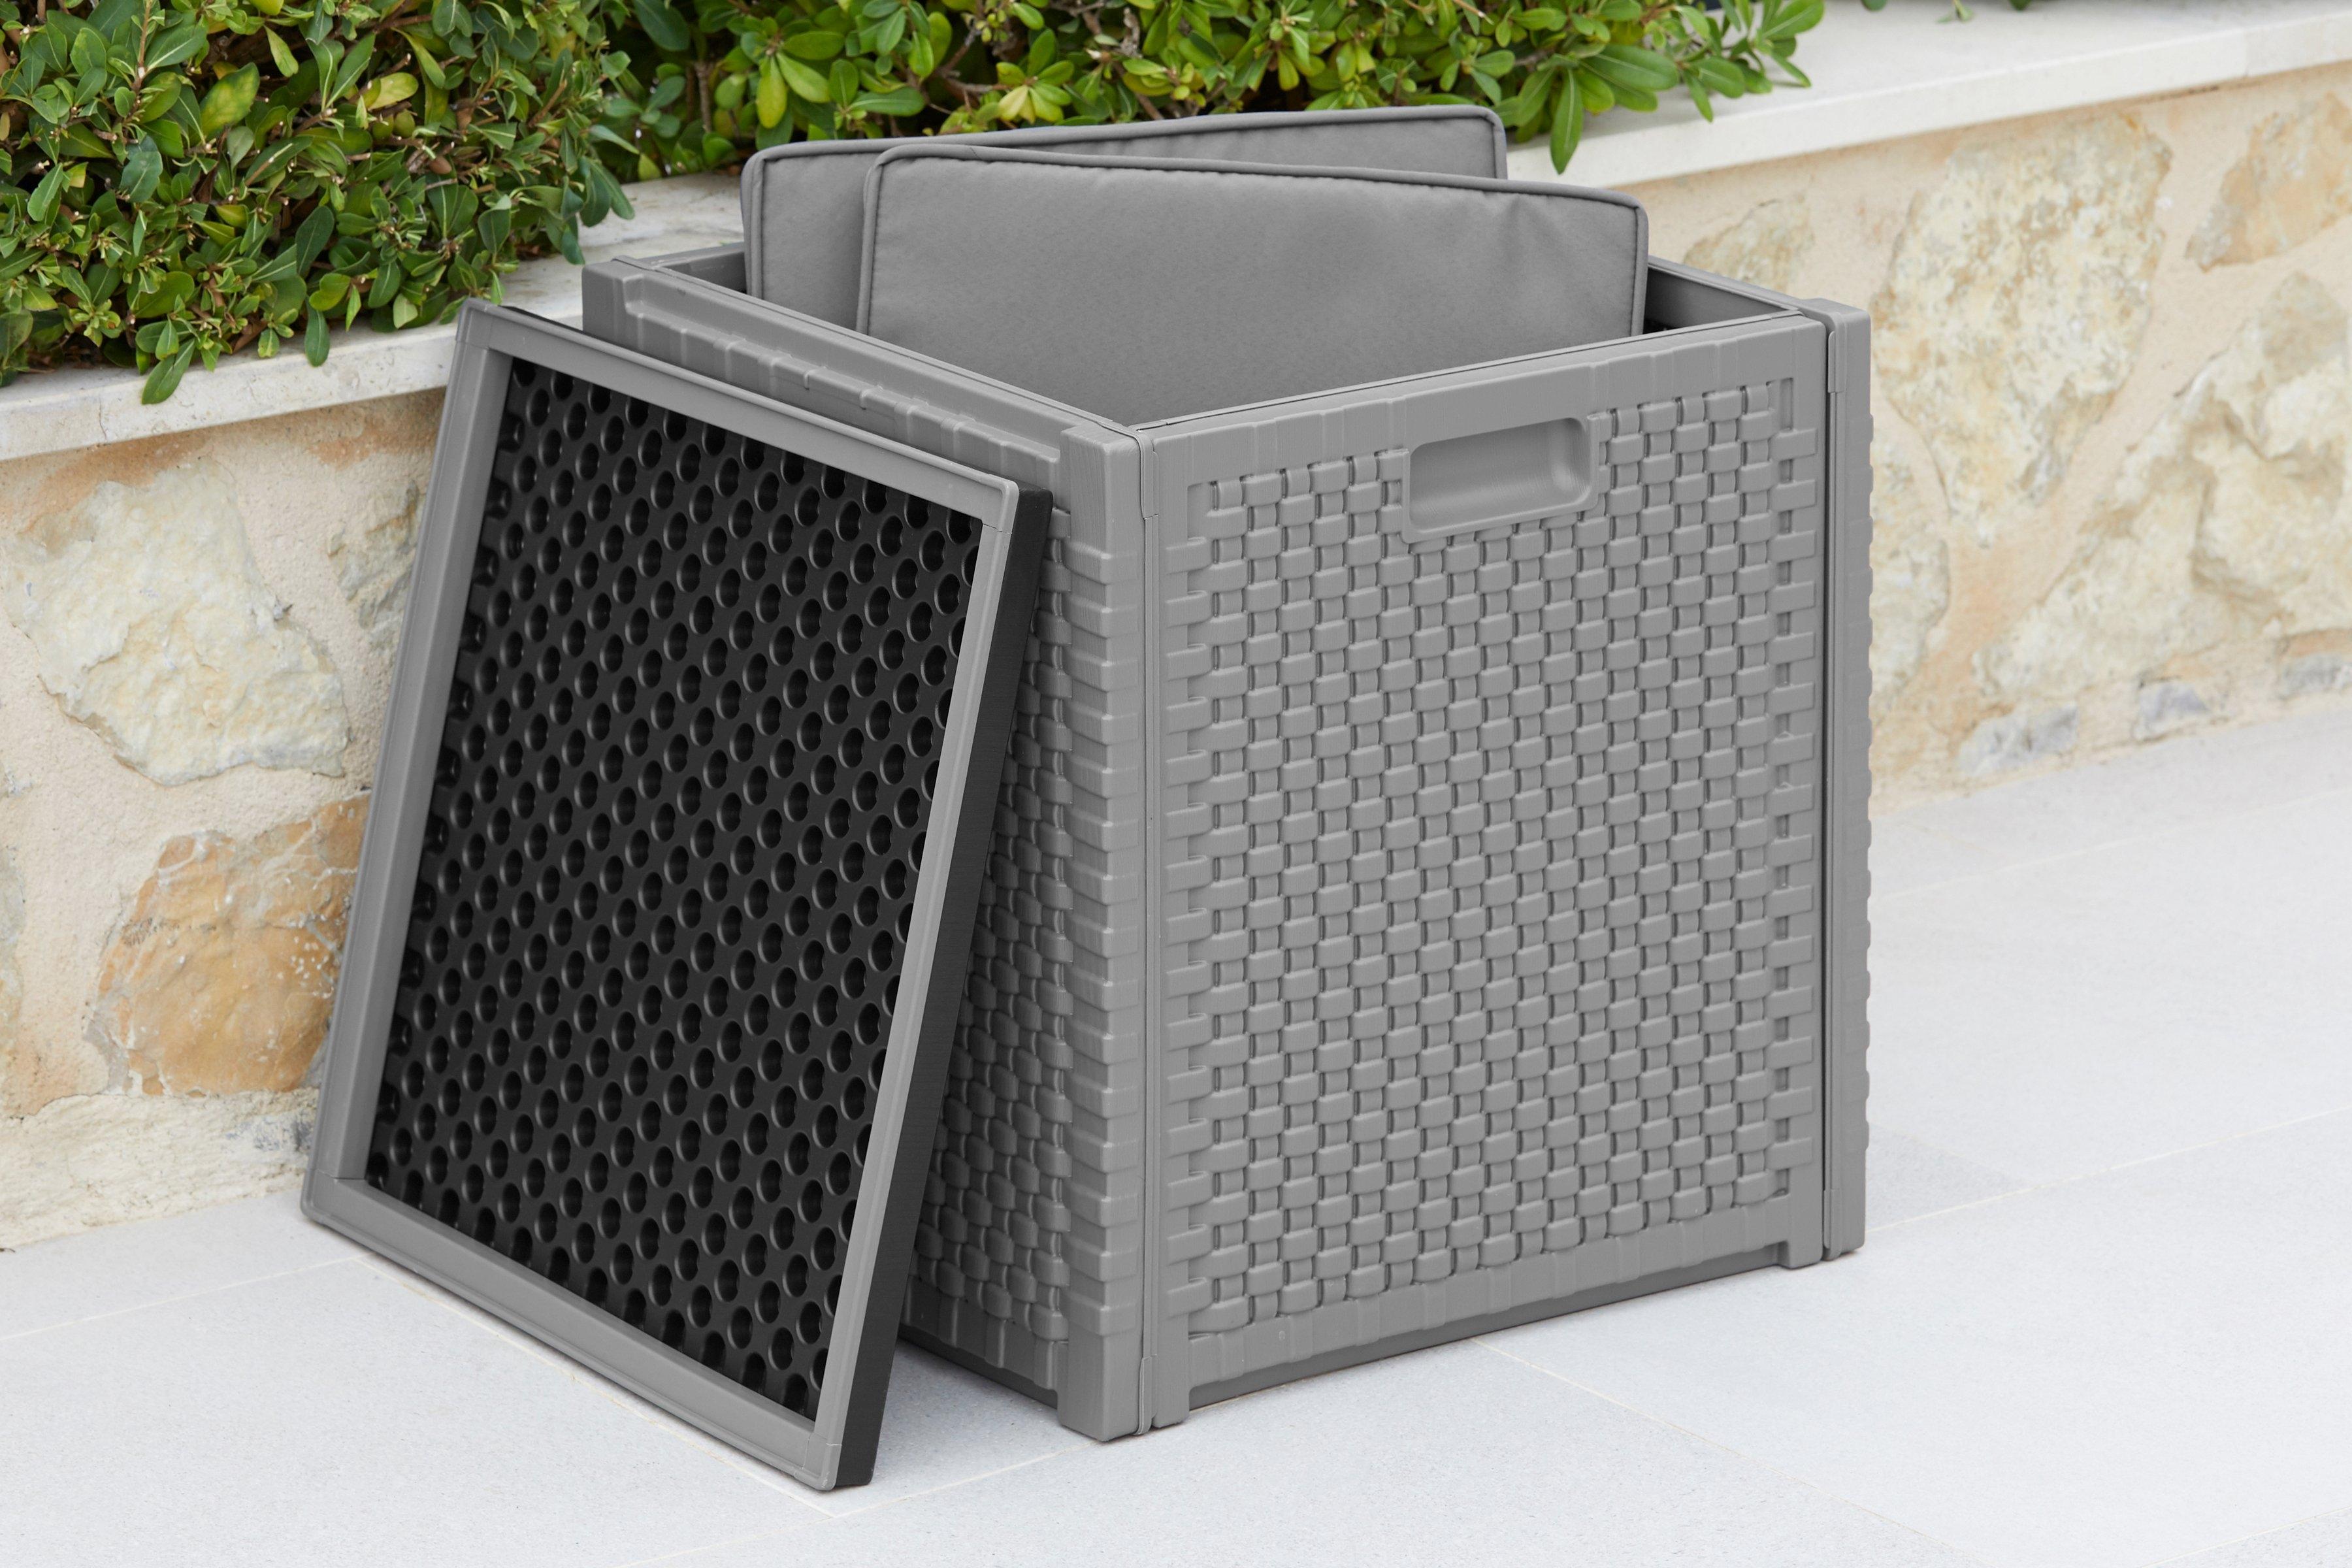 KMP GARTEN GUT kussenbox afm. (bxdxh): ca. 47x47x52 cm, volume ca. 160 liter - gratis ruilen op otto.nl